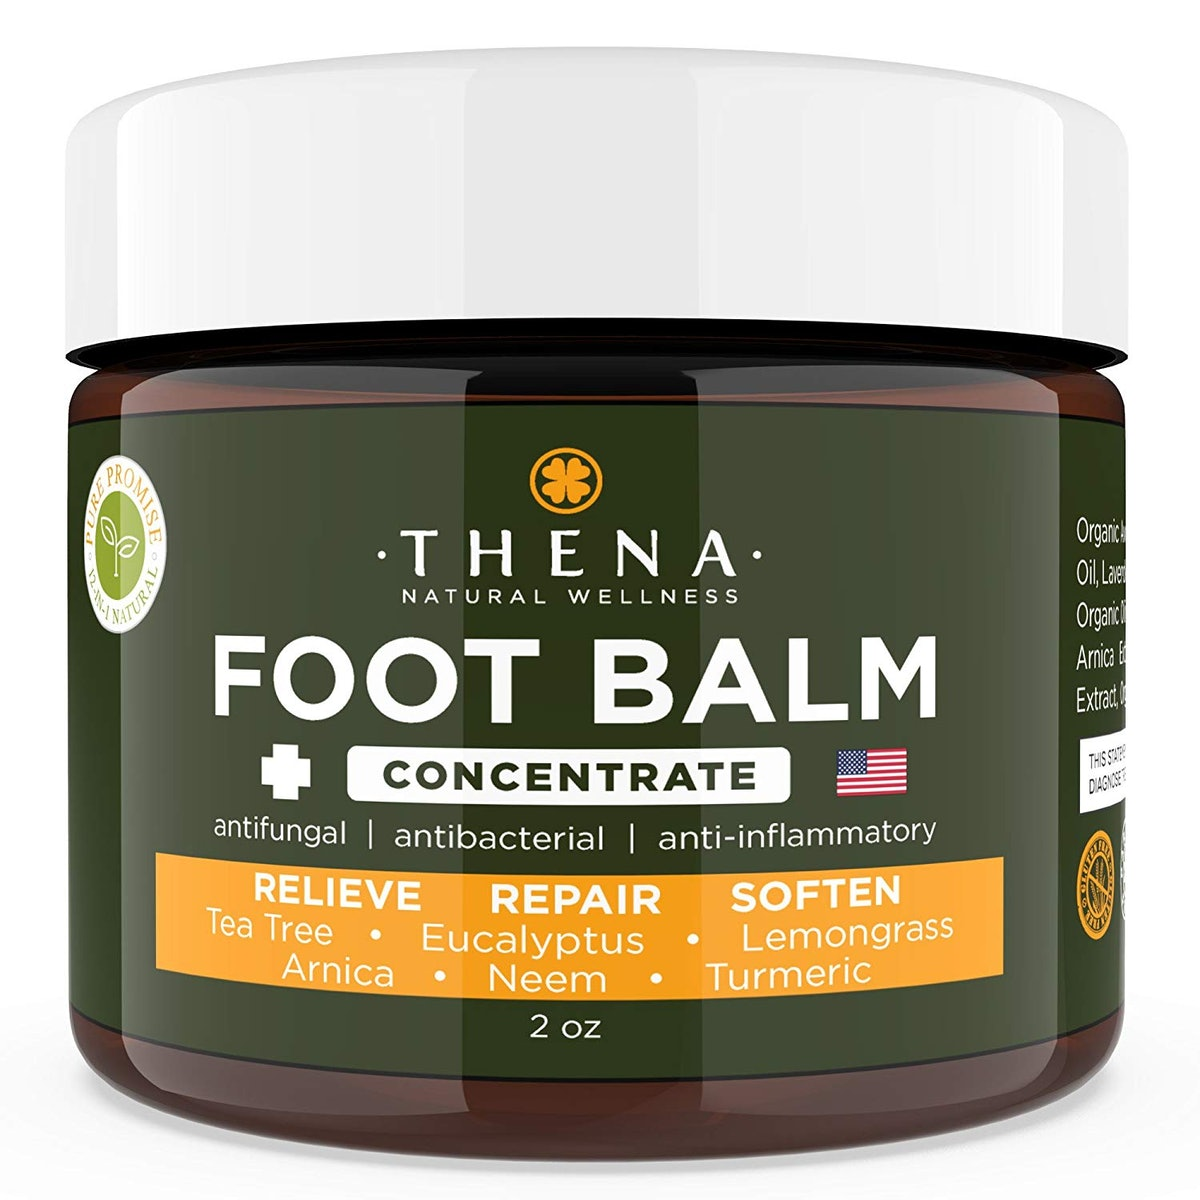 THENA Natural Wellness Foot Cream